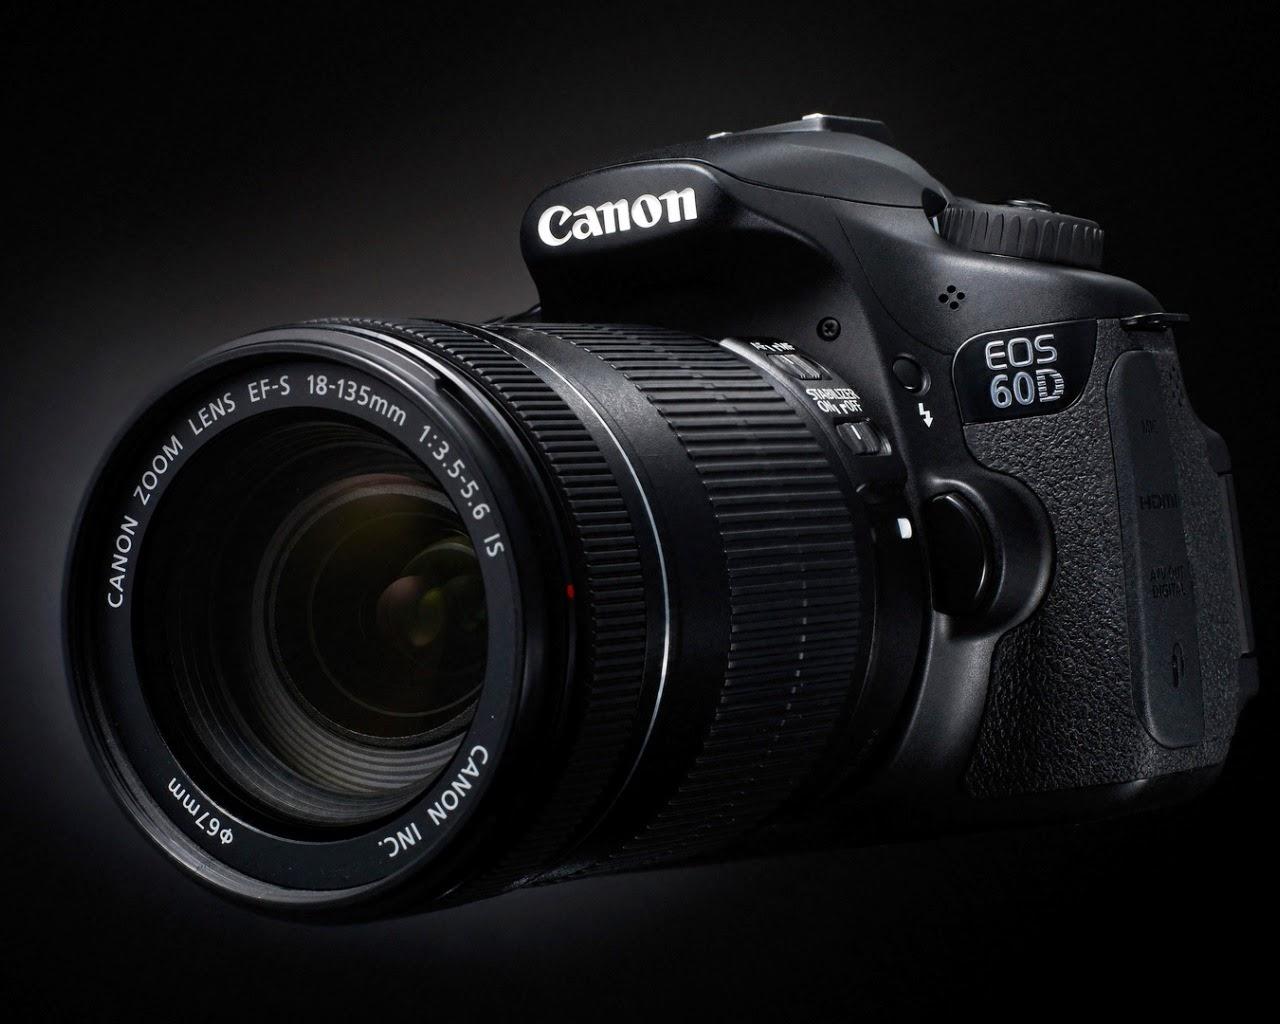 Canon eos 60d camera for 600